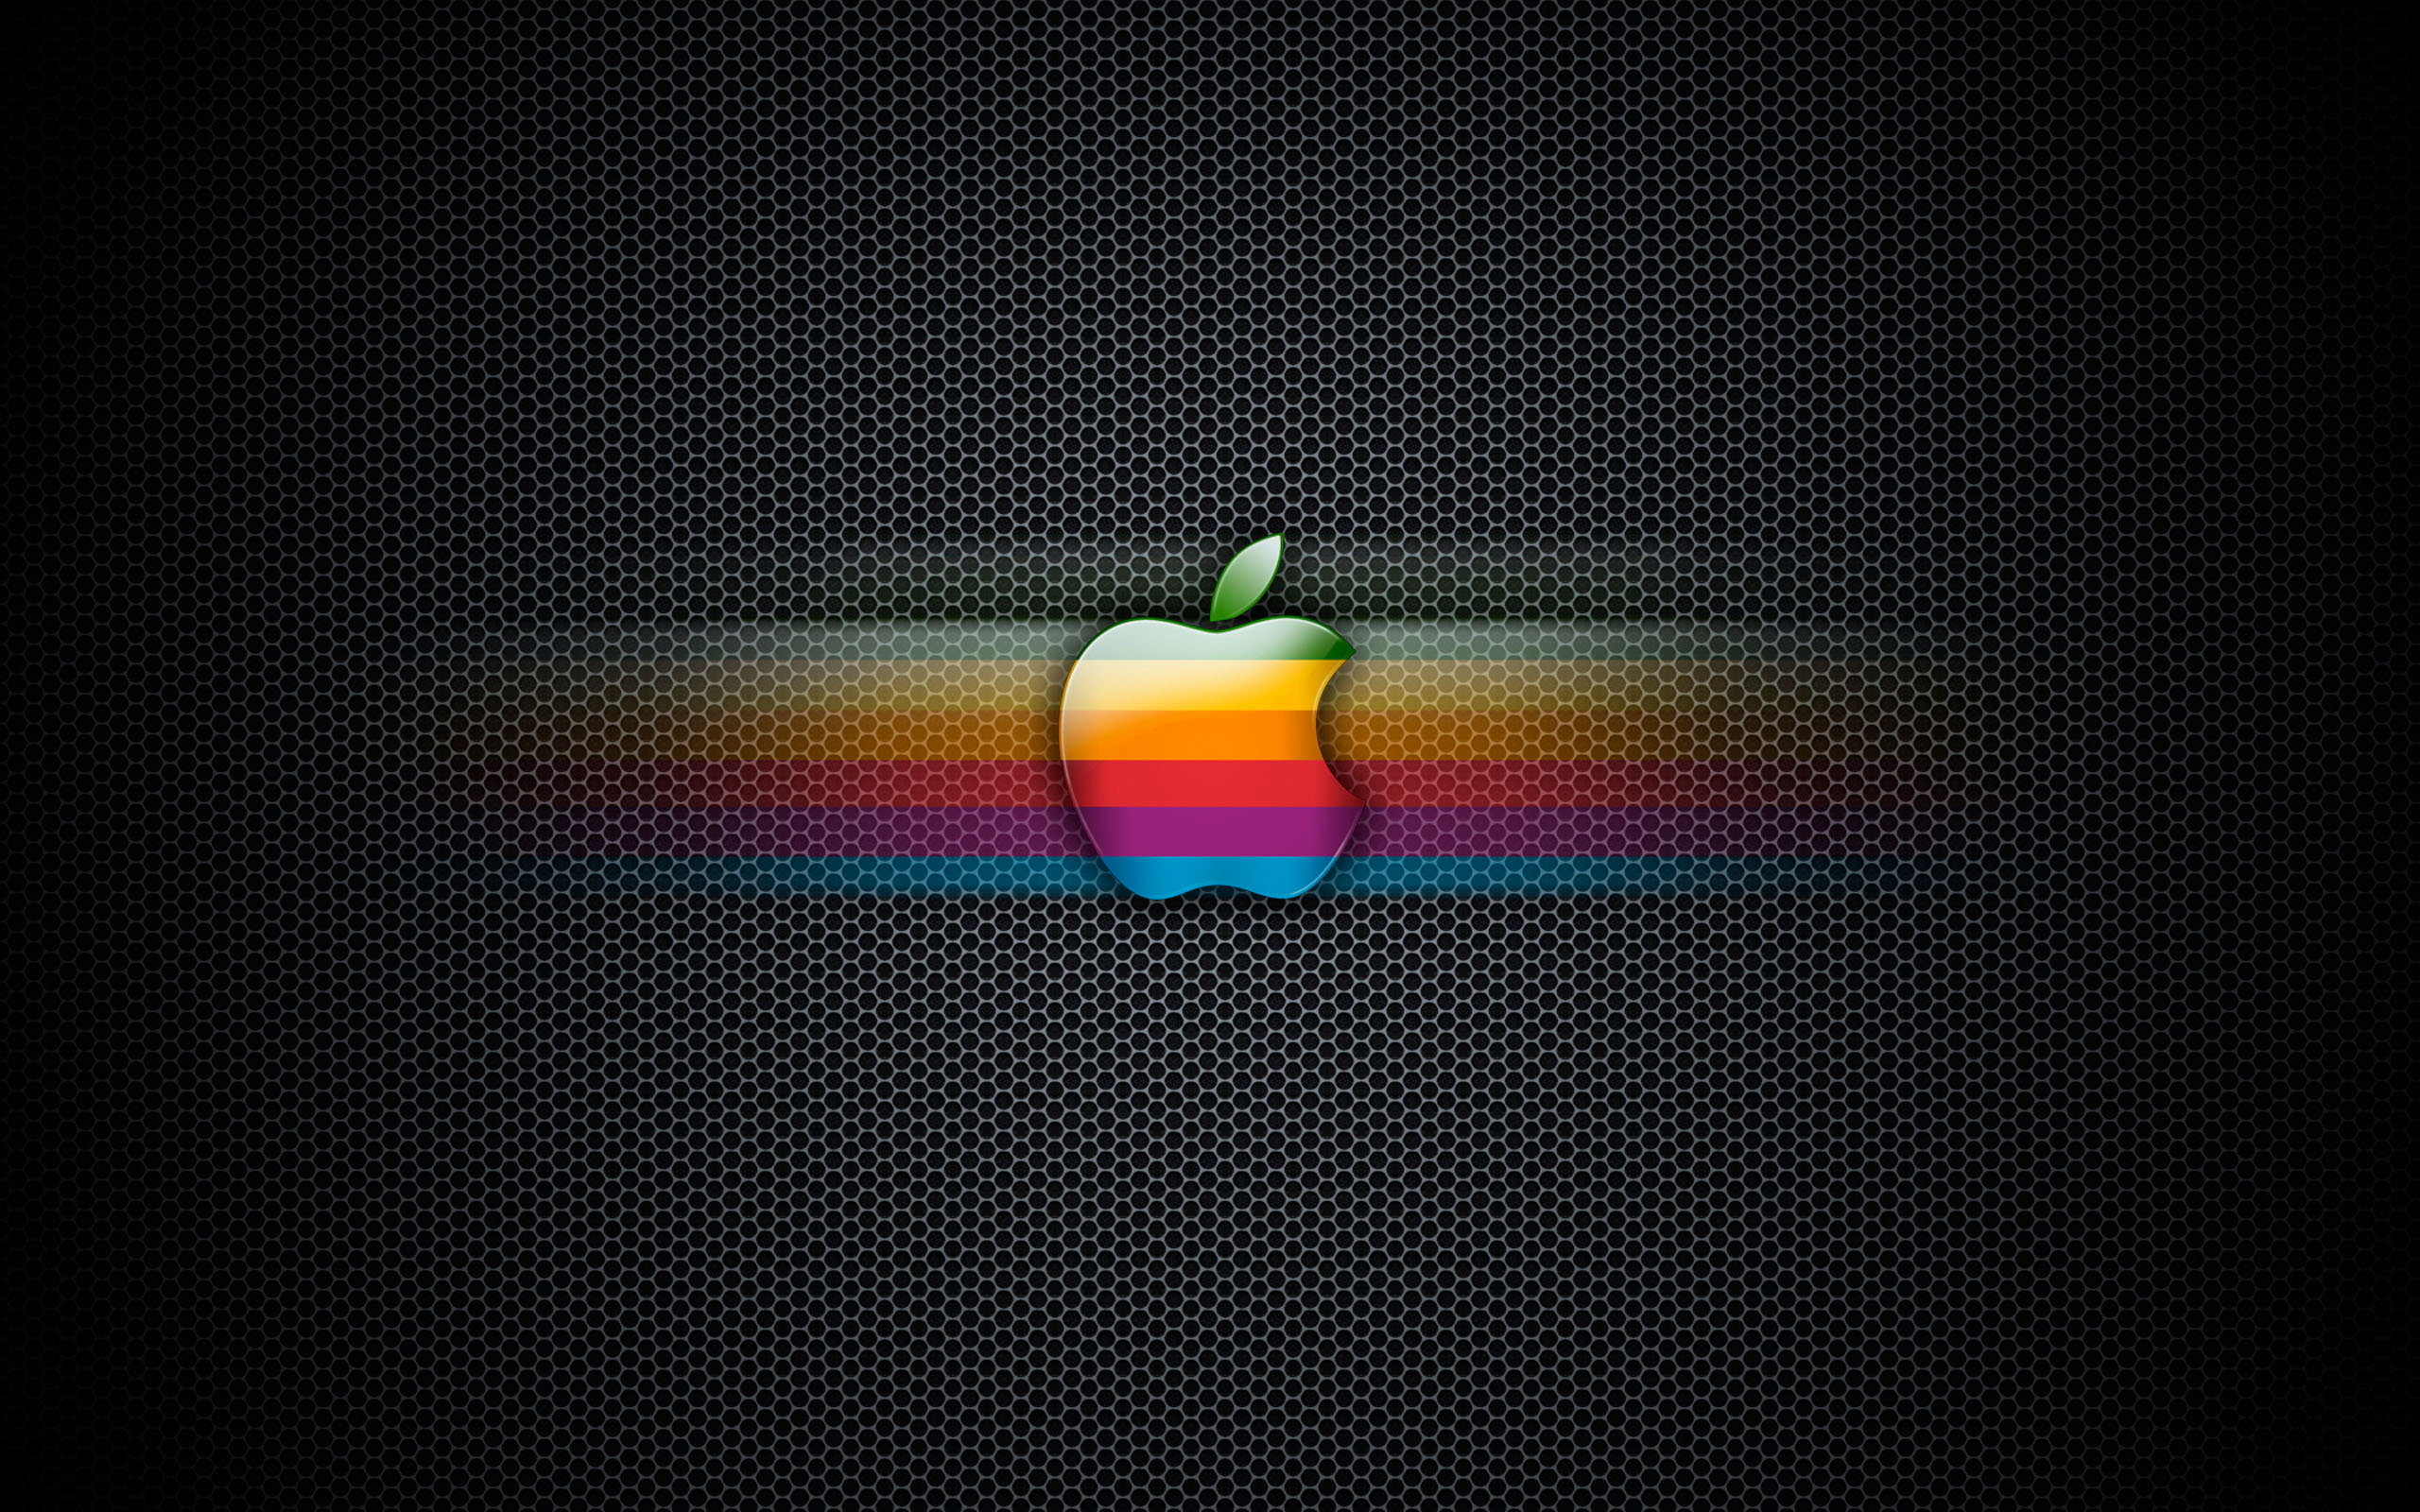 Macbook Air HD Wallpapers 7 Freetopwallpapercom 2560x1600